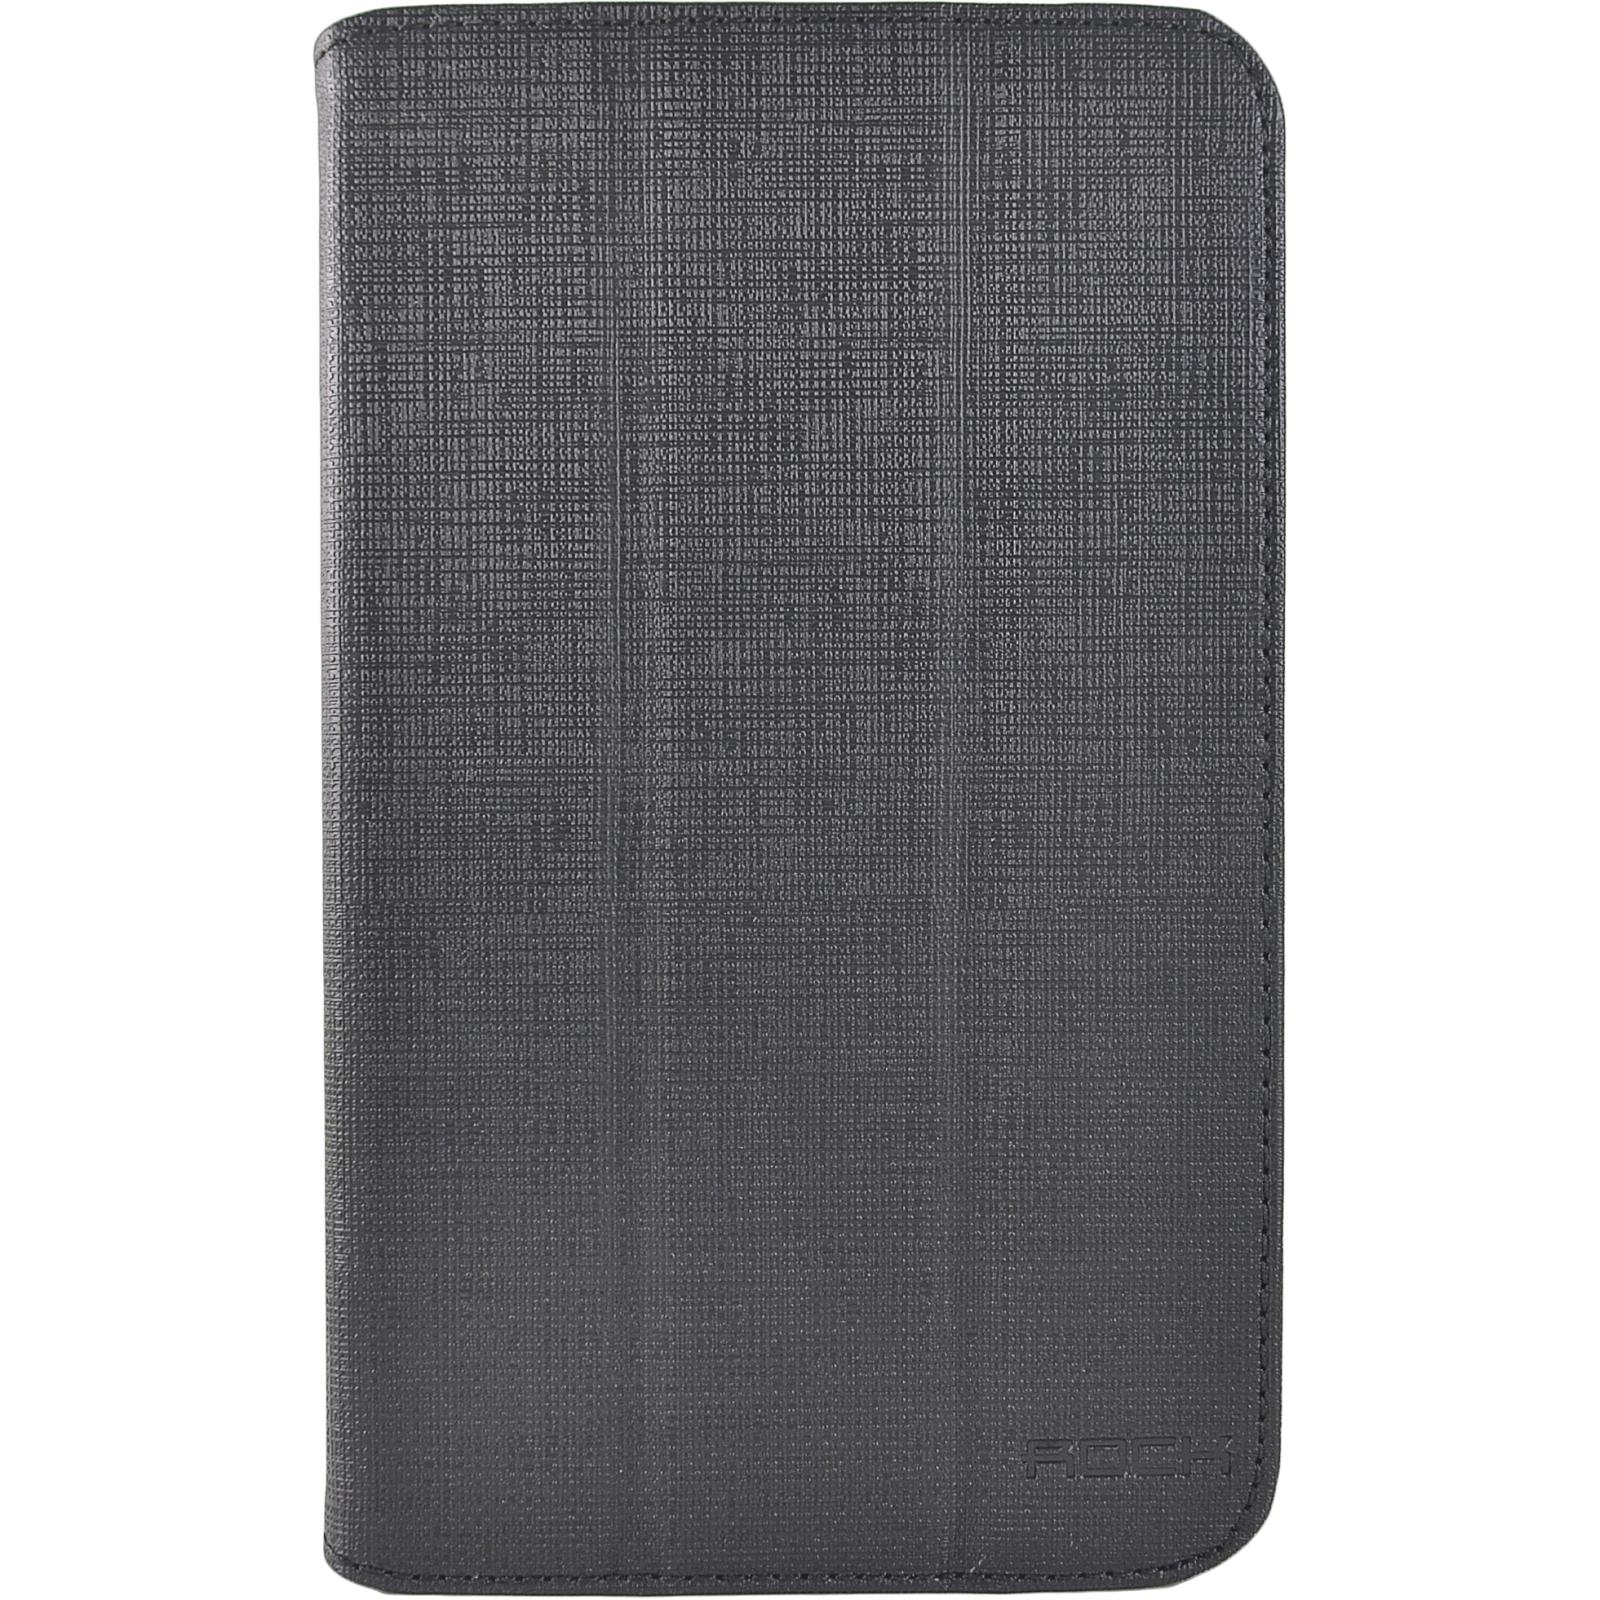 "Чехол для планшета Rock 7"" Samsung Galaxy Tab 3 7.0 T2100/T2110 Flexible Series (32006 black)"